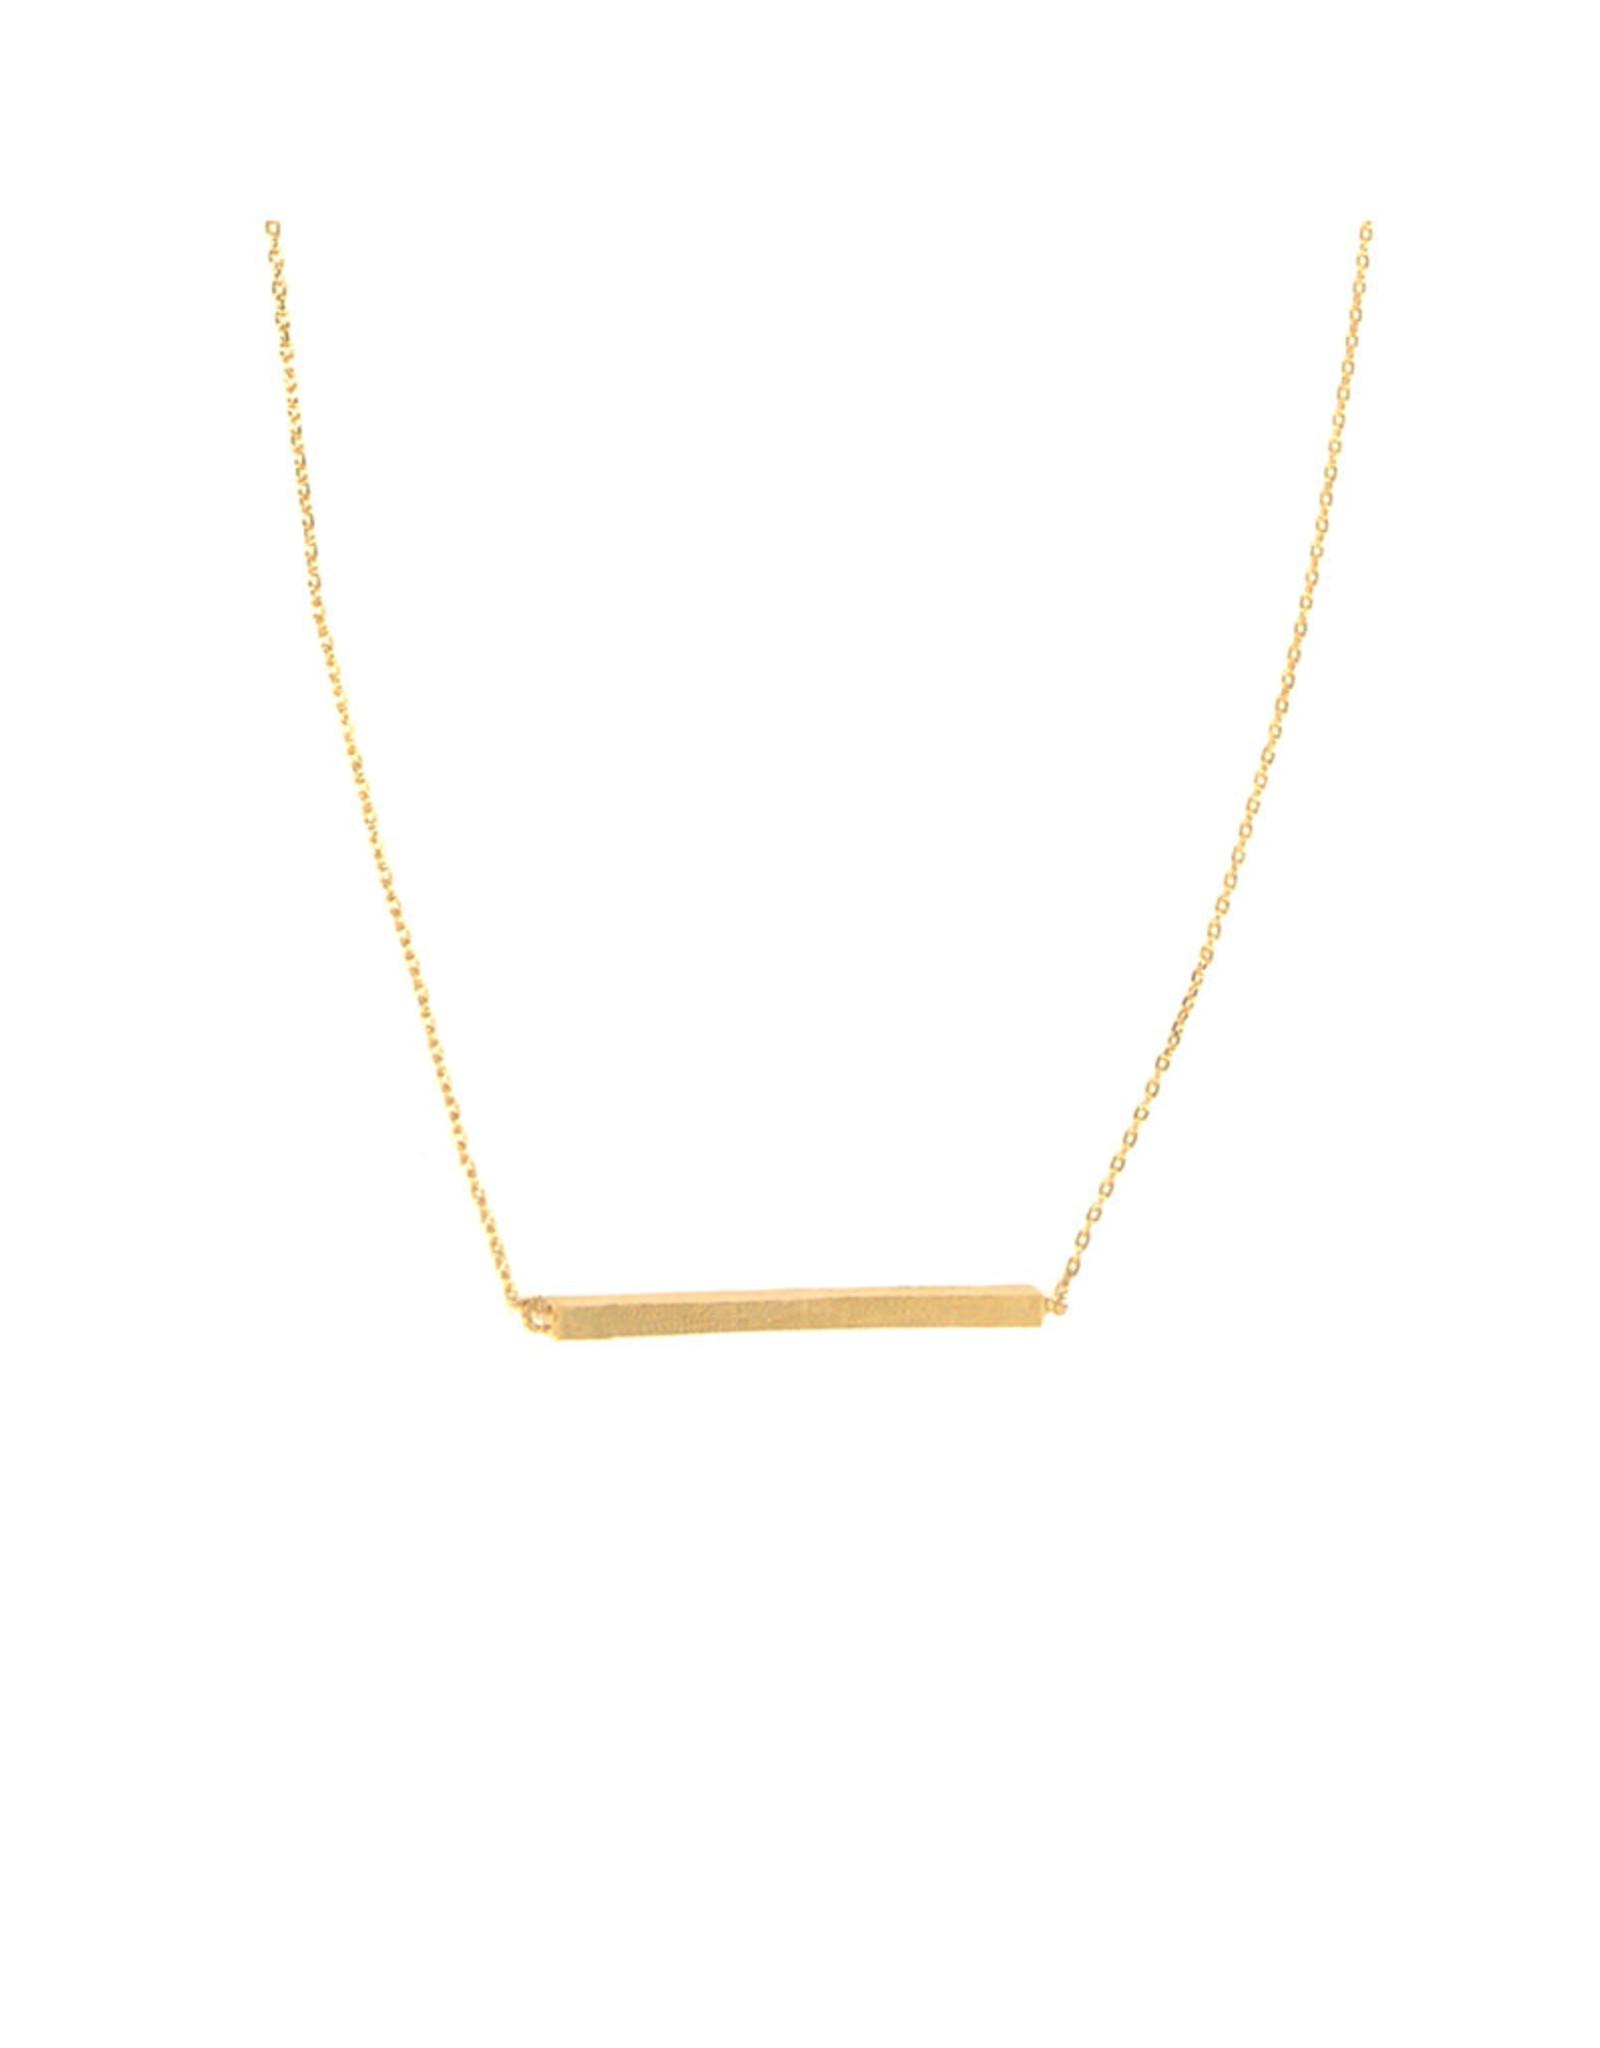 Gold Textured Bar Necklace